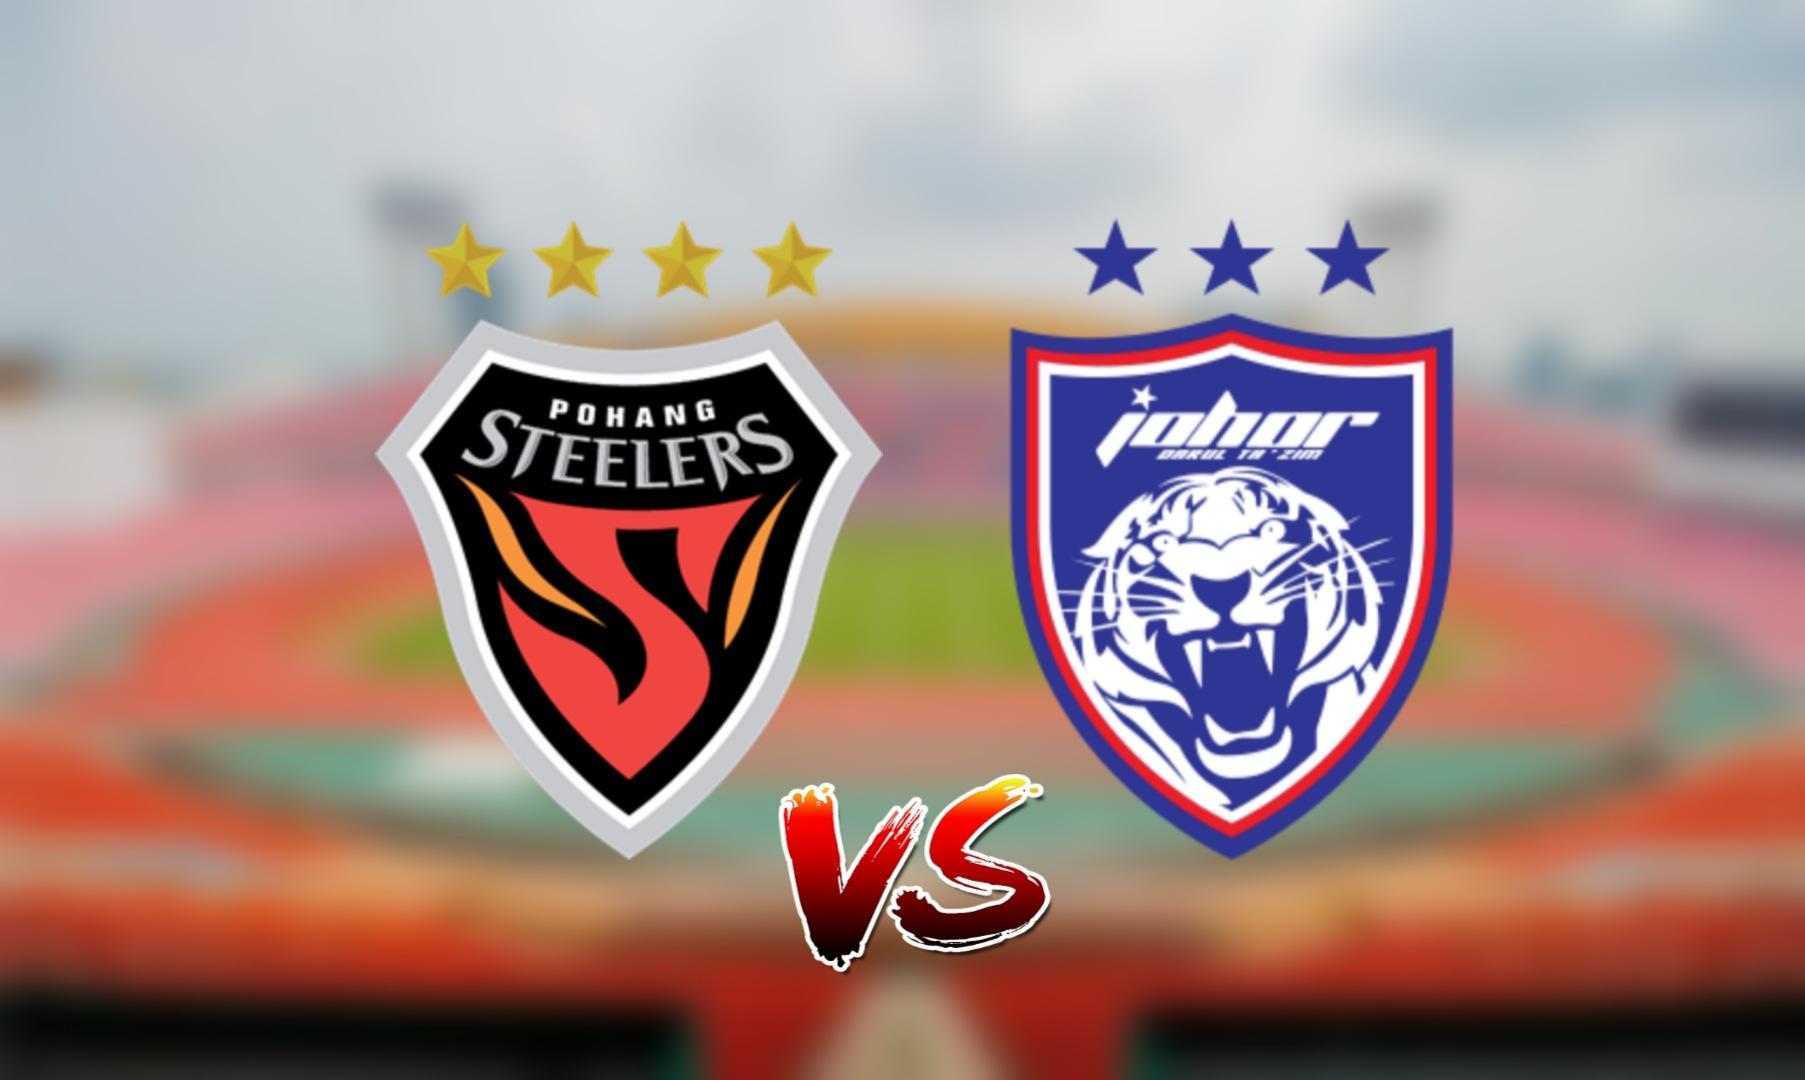 Live Streaming Pohang Steelers vs JDT FC ACL 28 Jun 2021